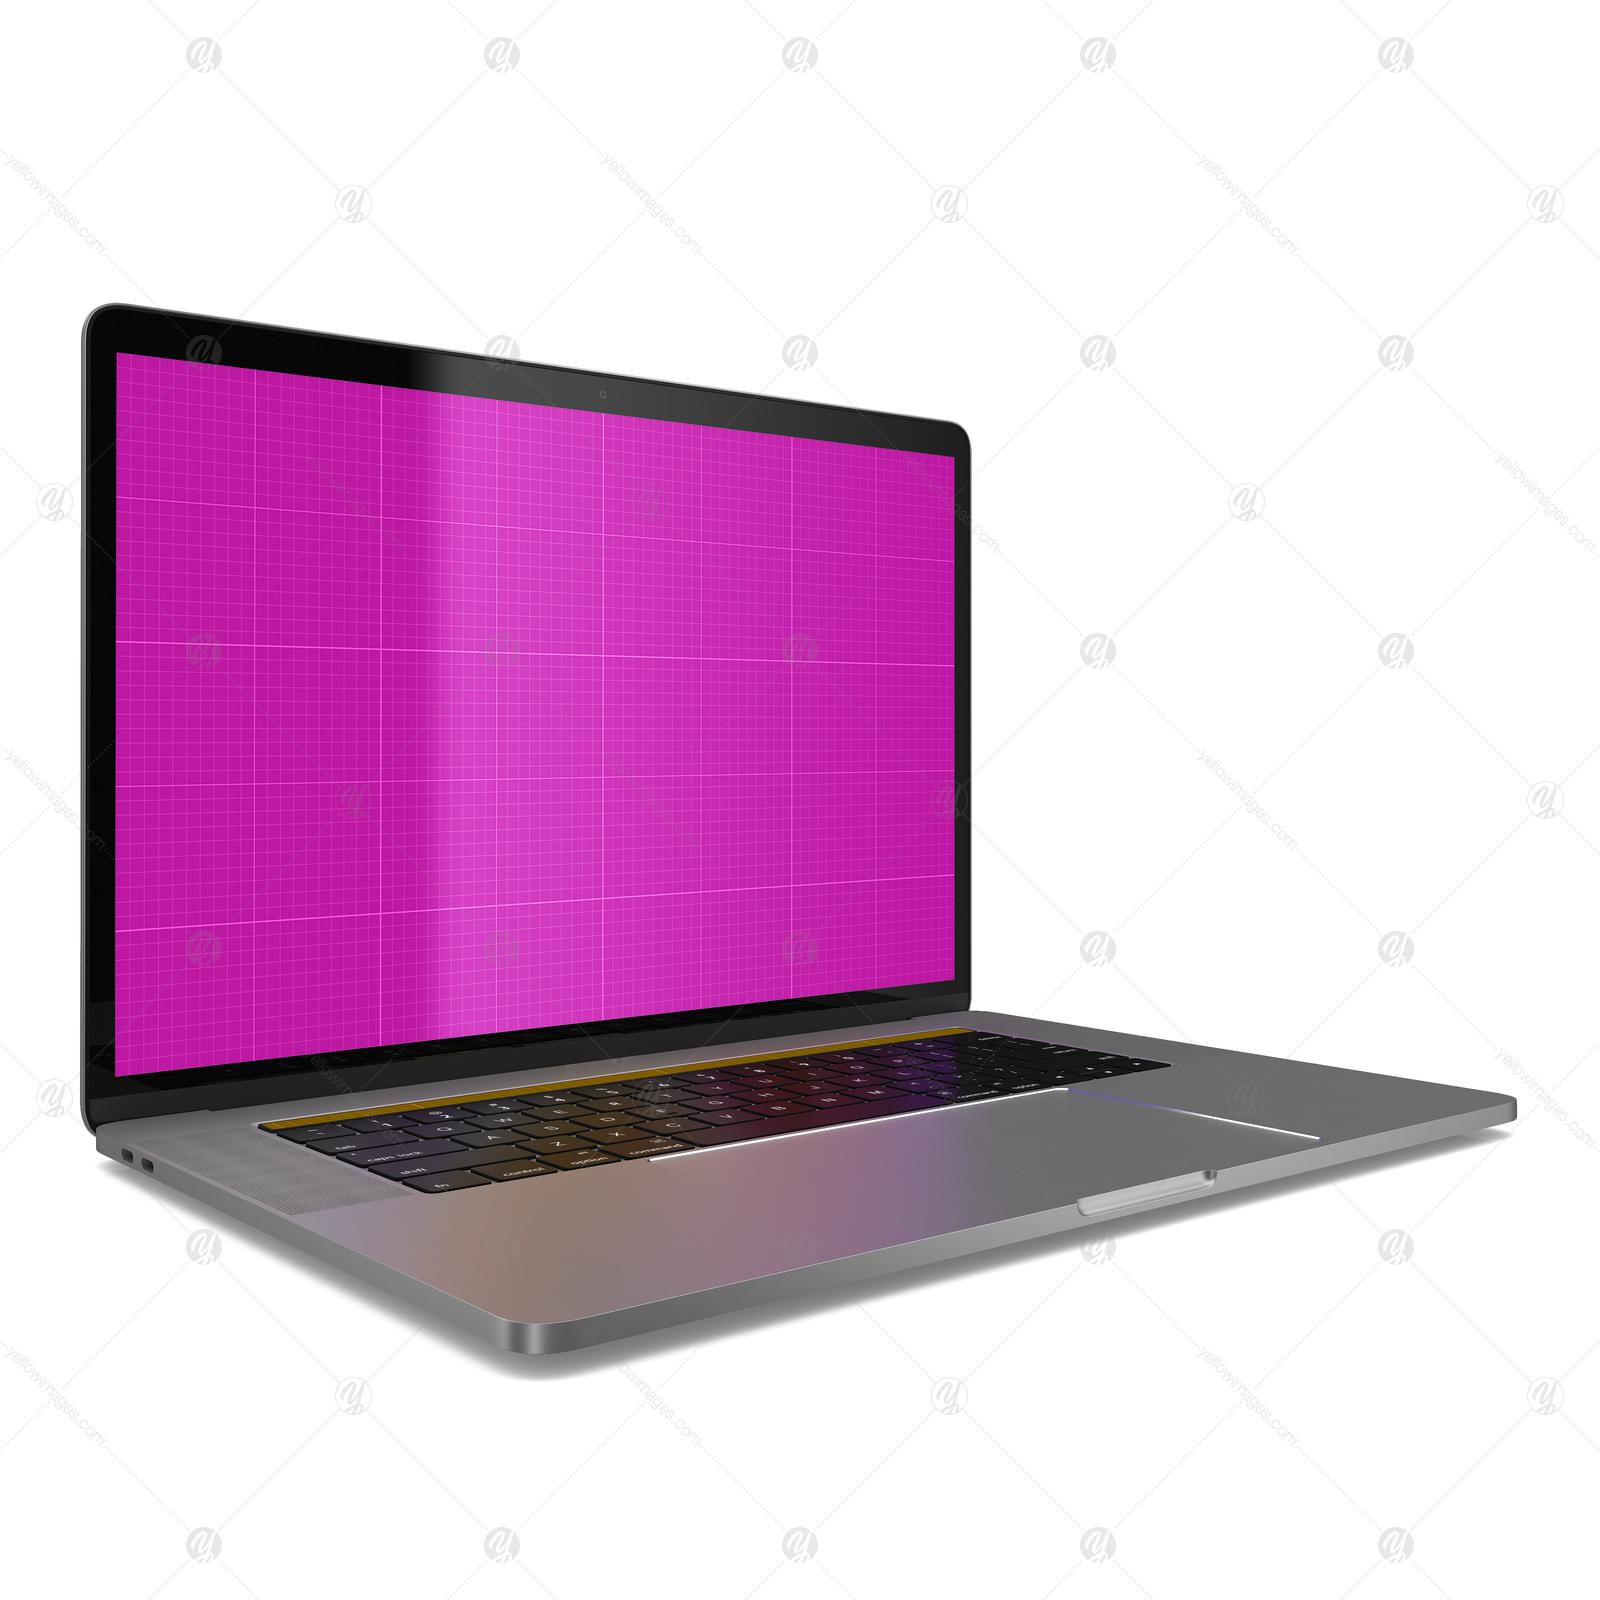 Macbook Pro kit